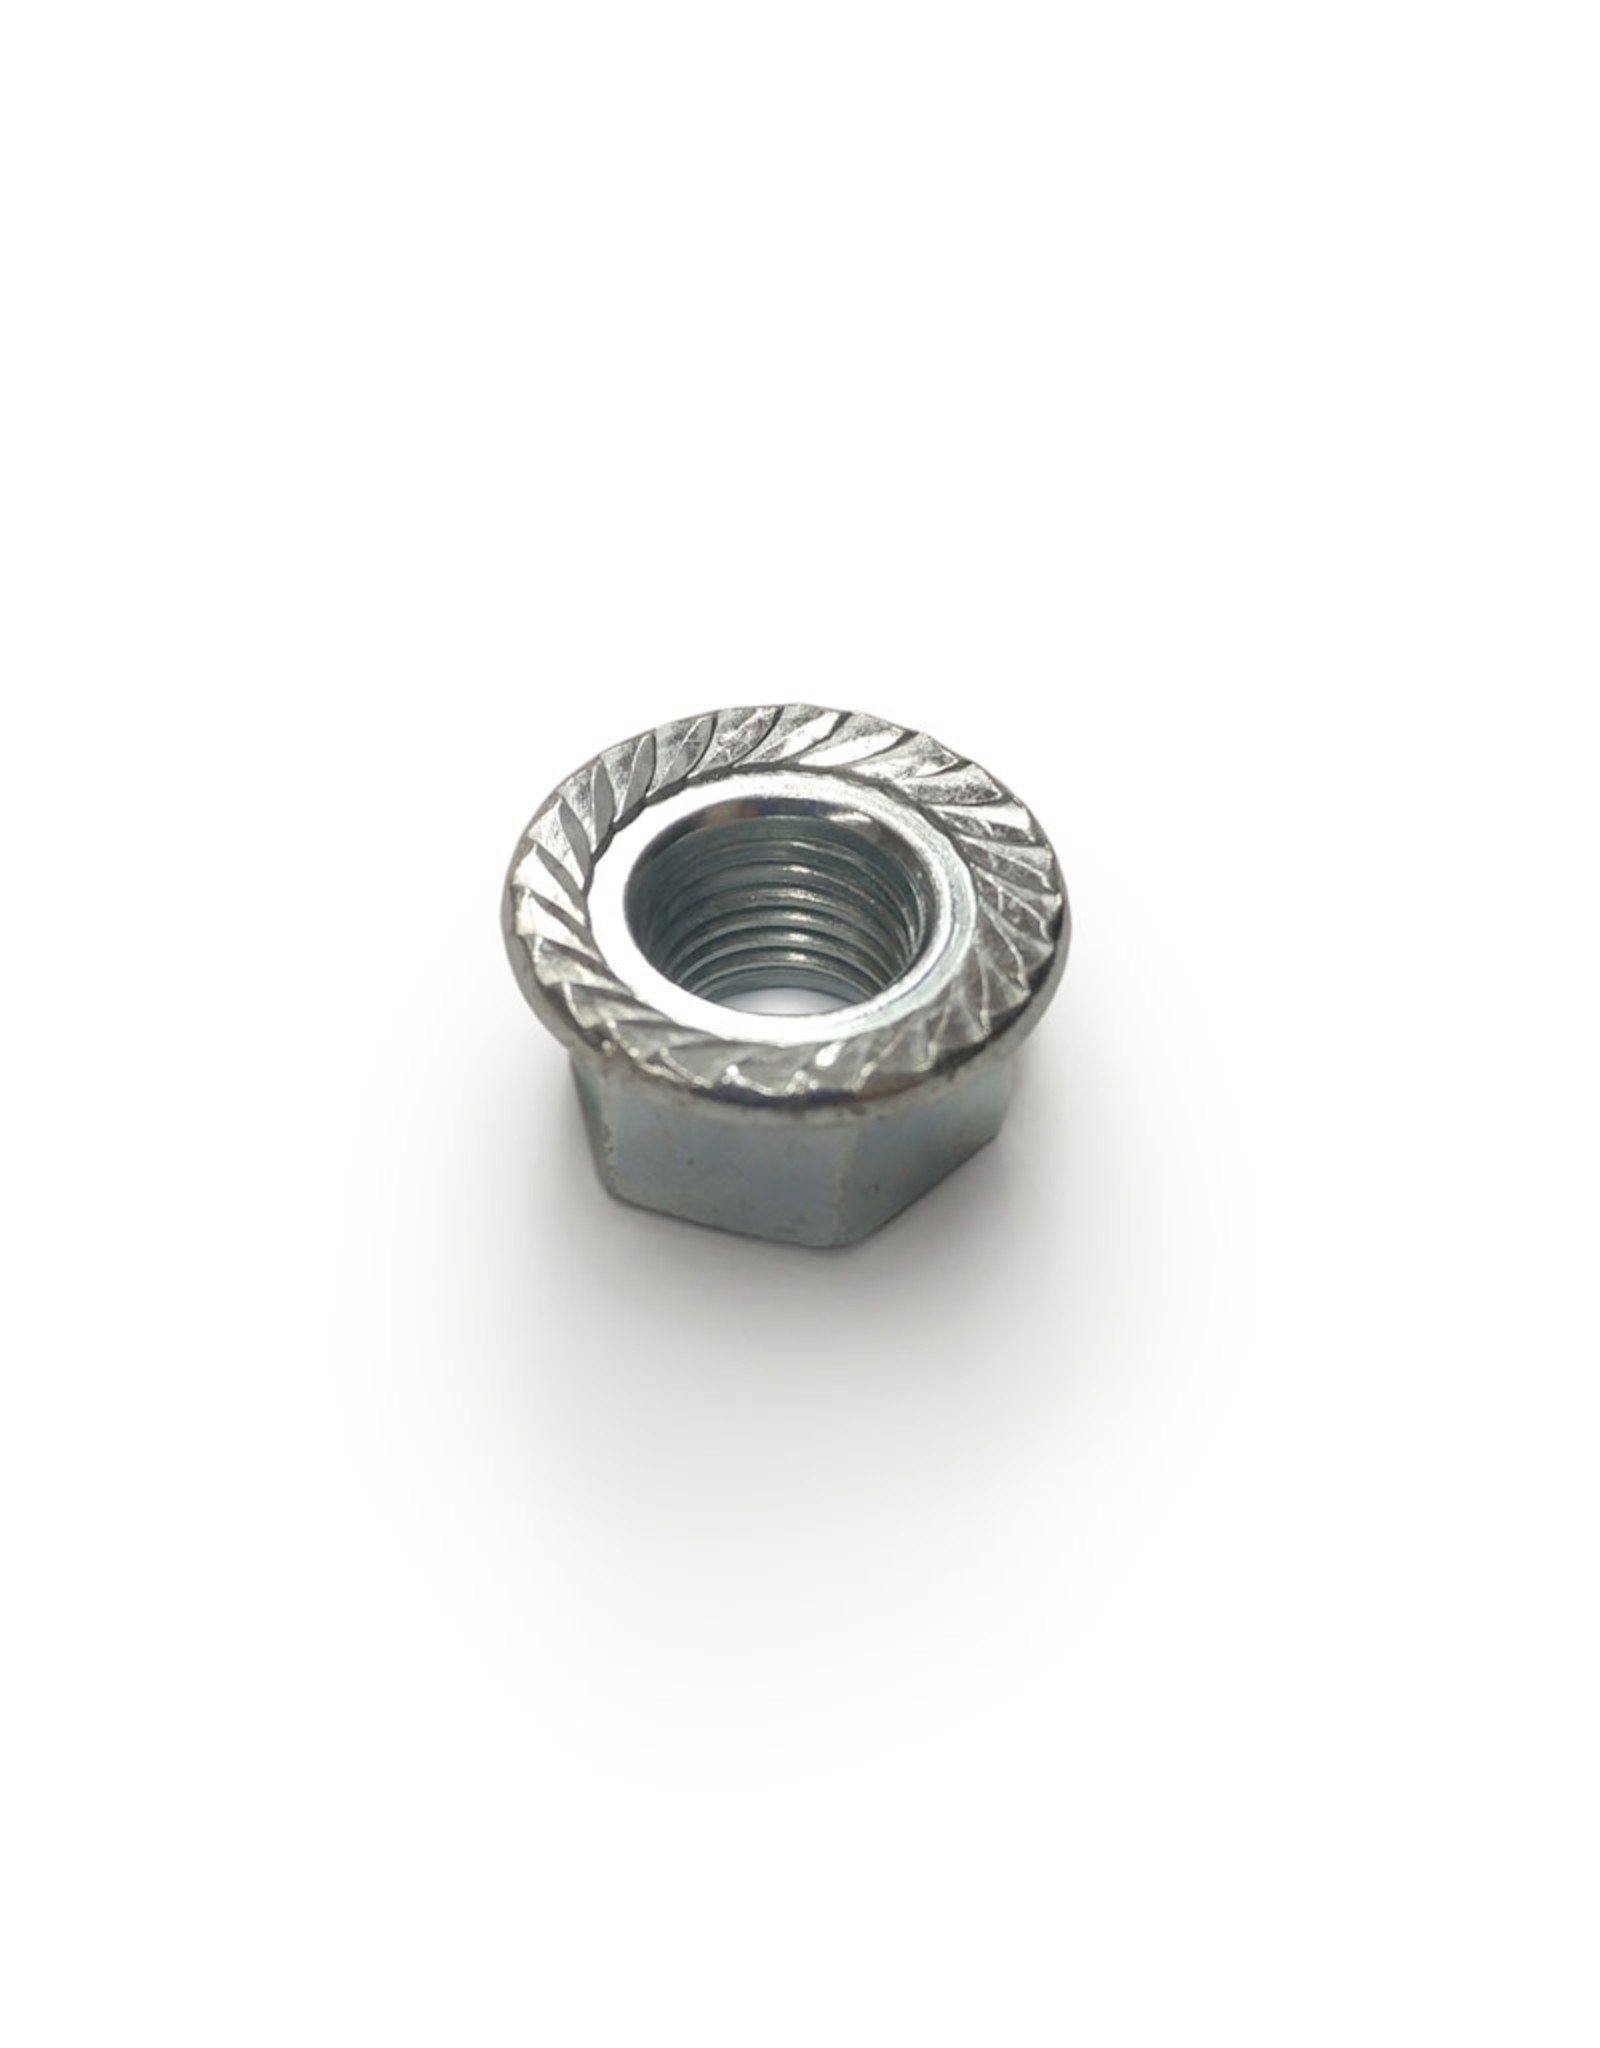 Damco Basic Damco Axle Nut (each)